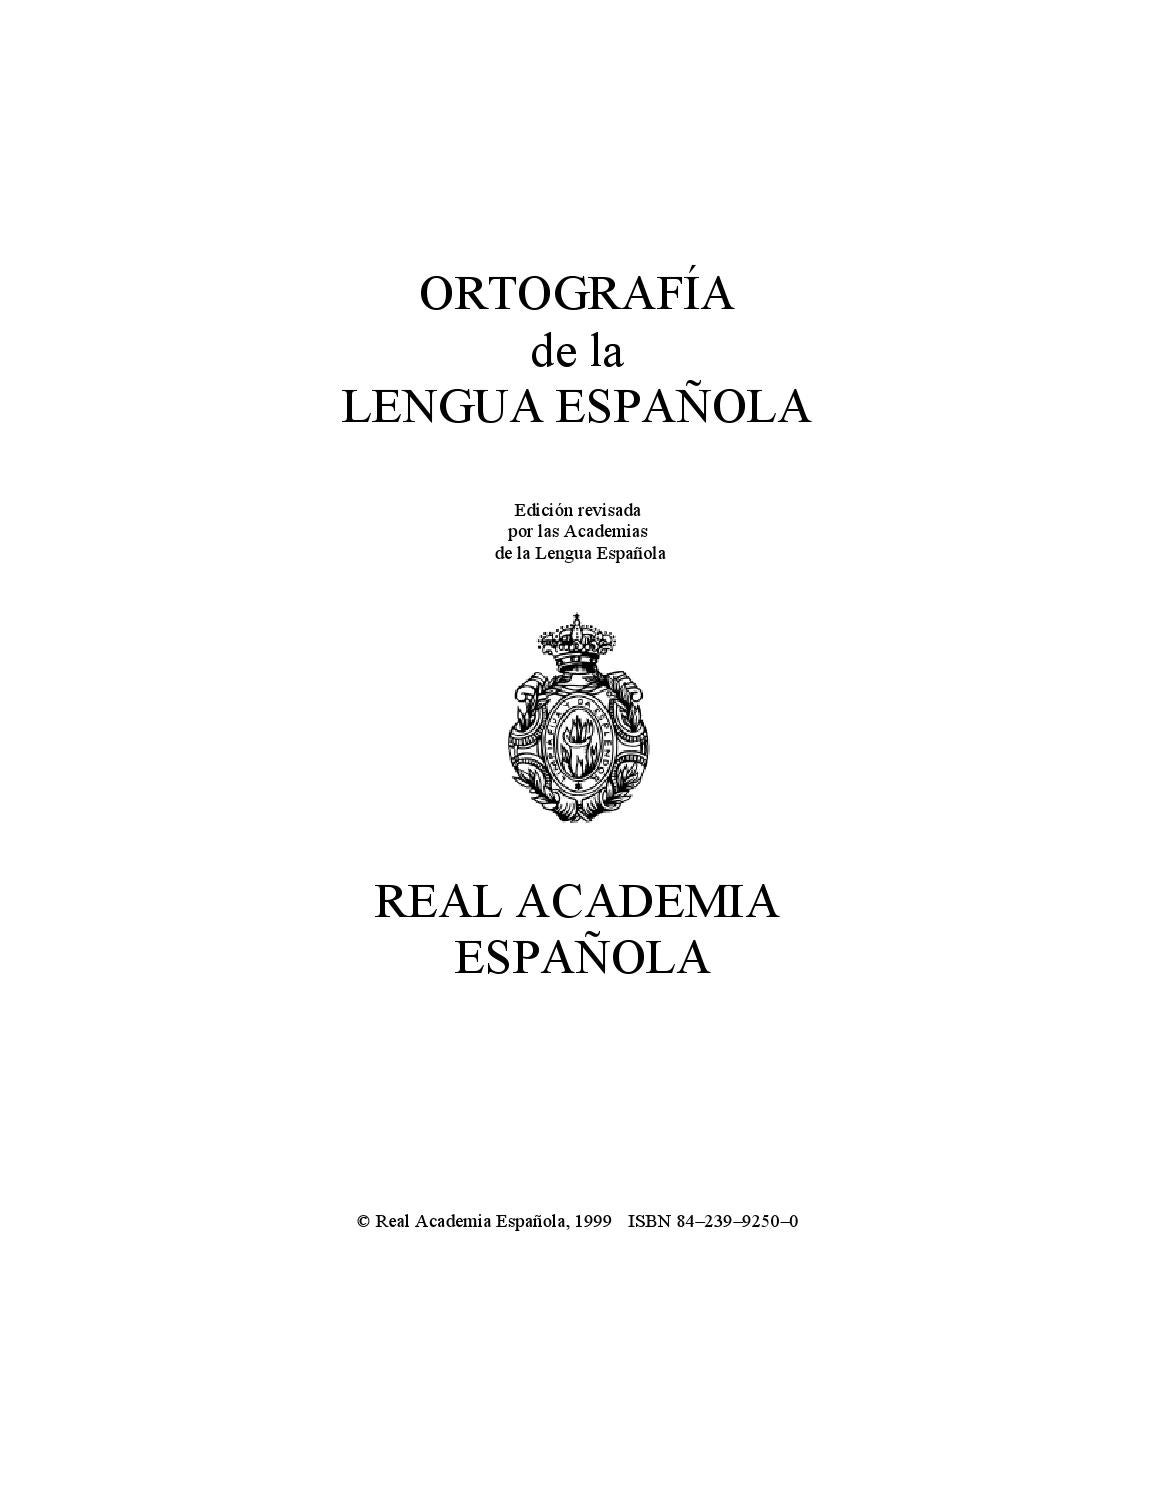 Joauris Luna Noriega Issuu Ortografia By Valentina Fc3uK1TlJ